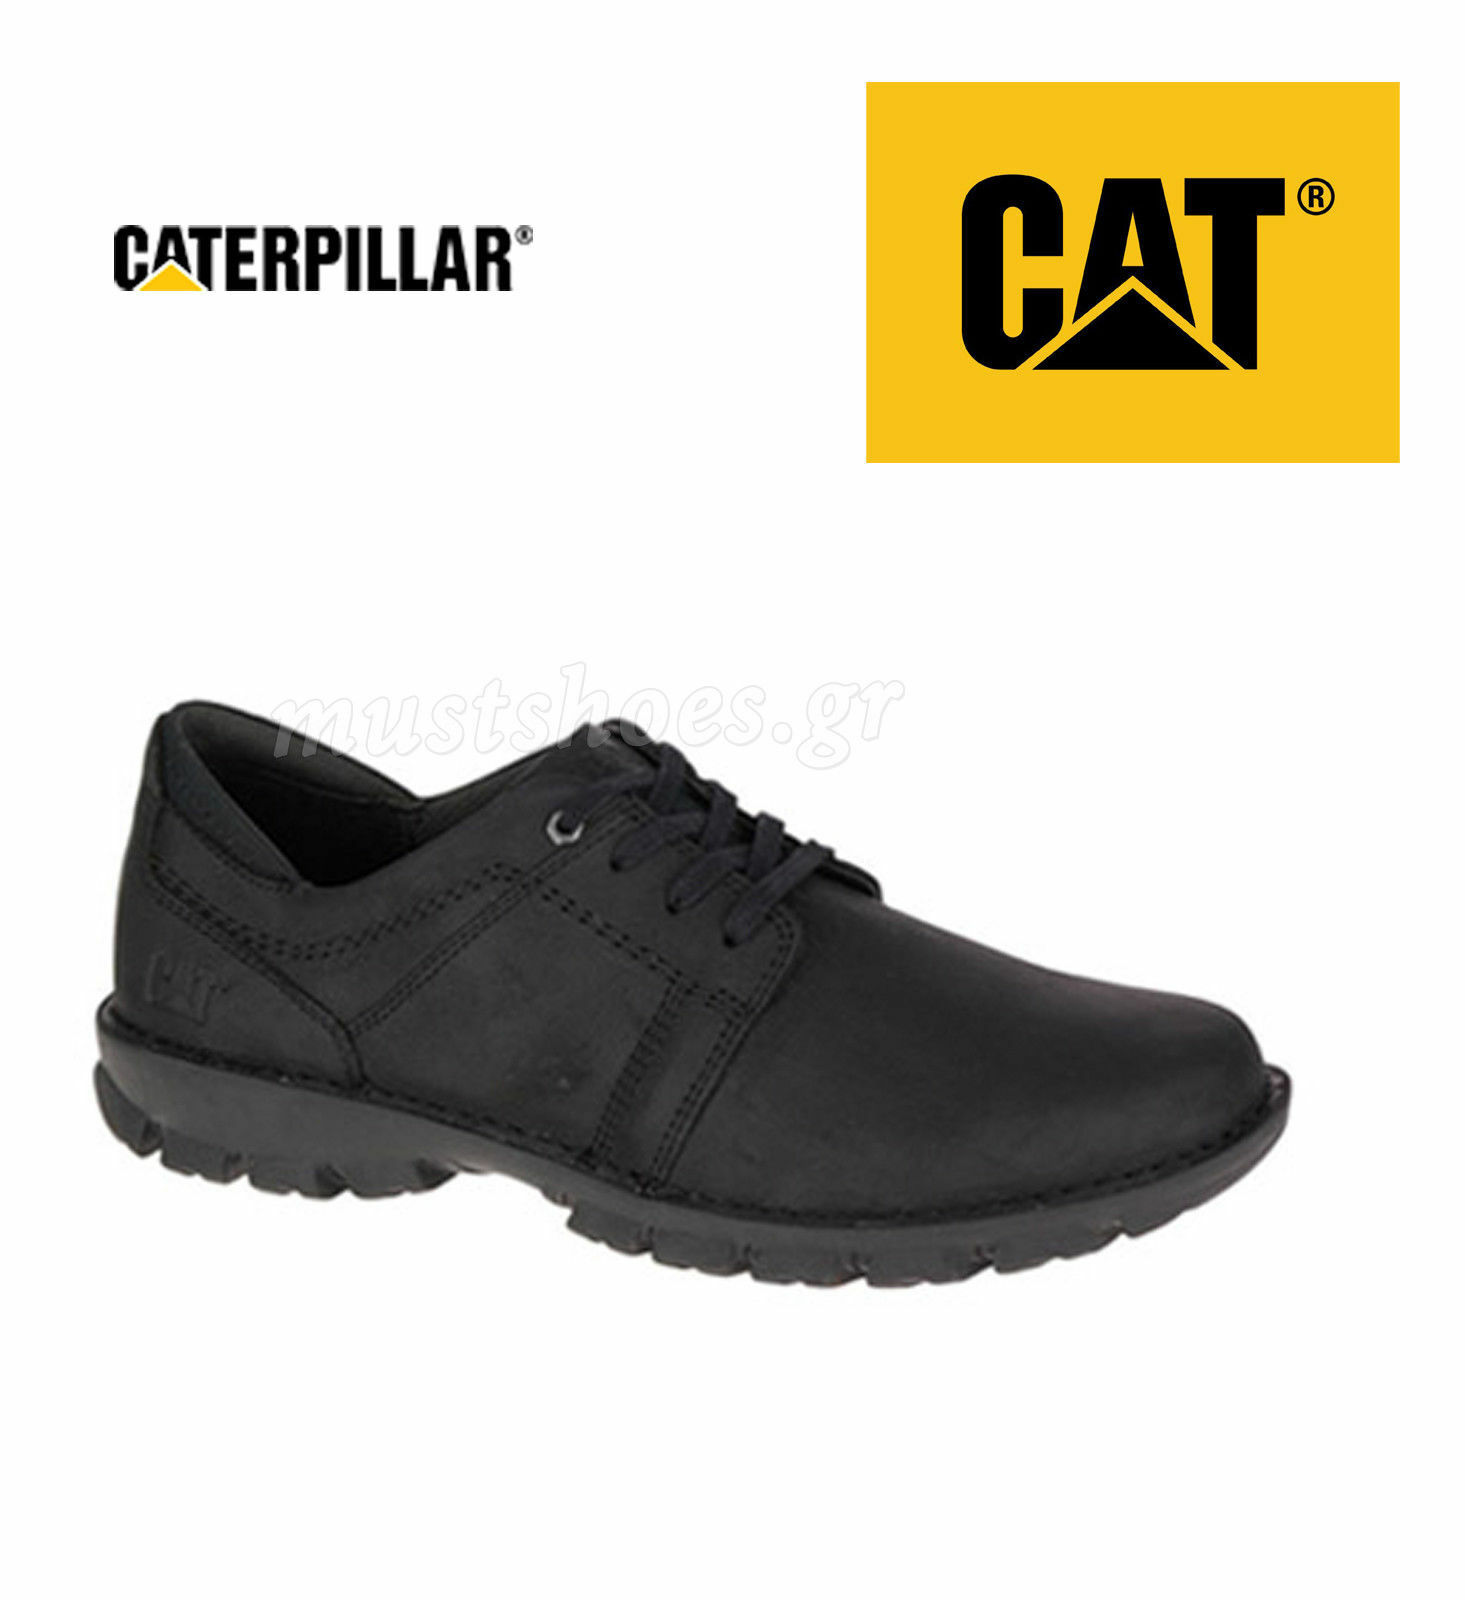 CATERPILLAR CAT 721553 CADEN BLACK EU 40, 41, 42, 43, 44, 45, 46